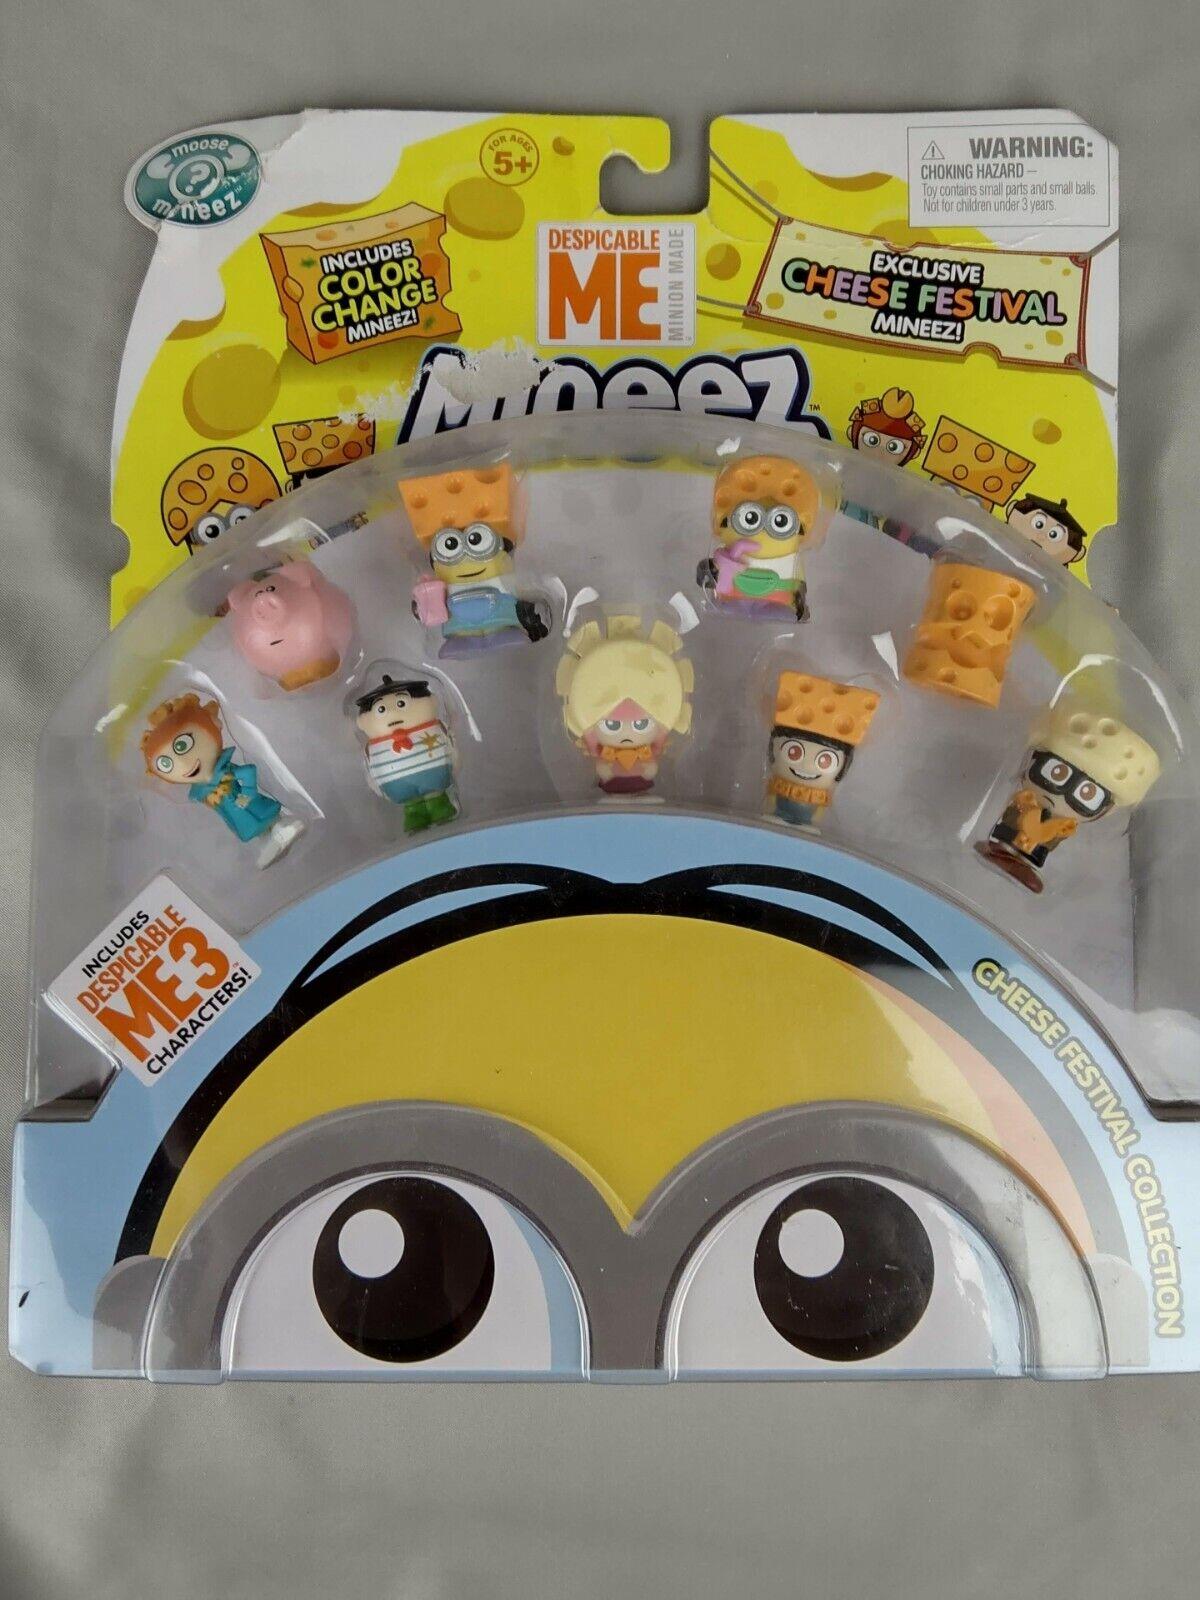 Despicable Me Minions Cheese Festival Mini Figure 9-Pack